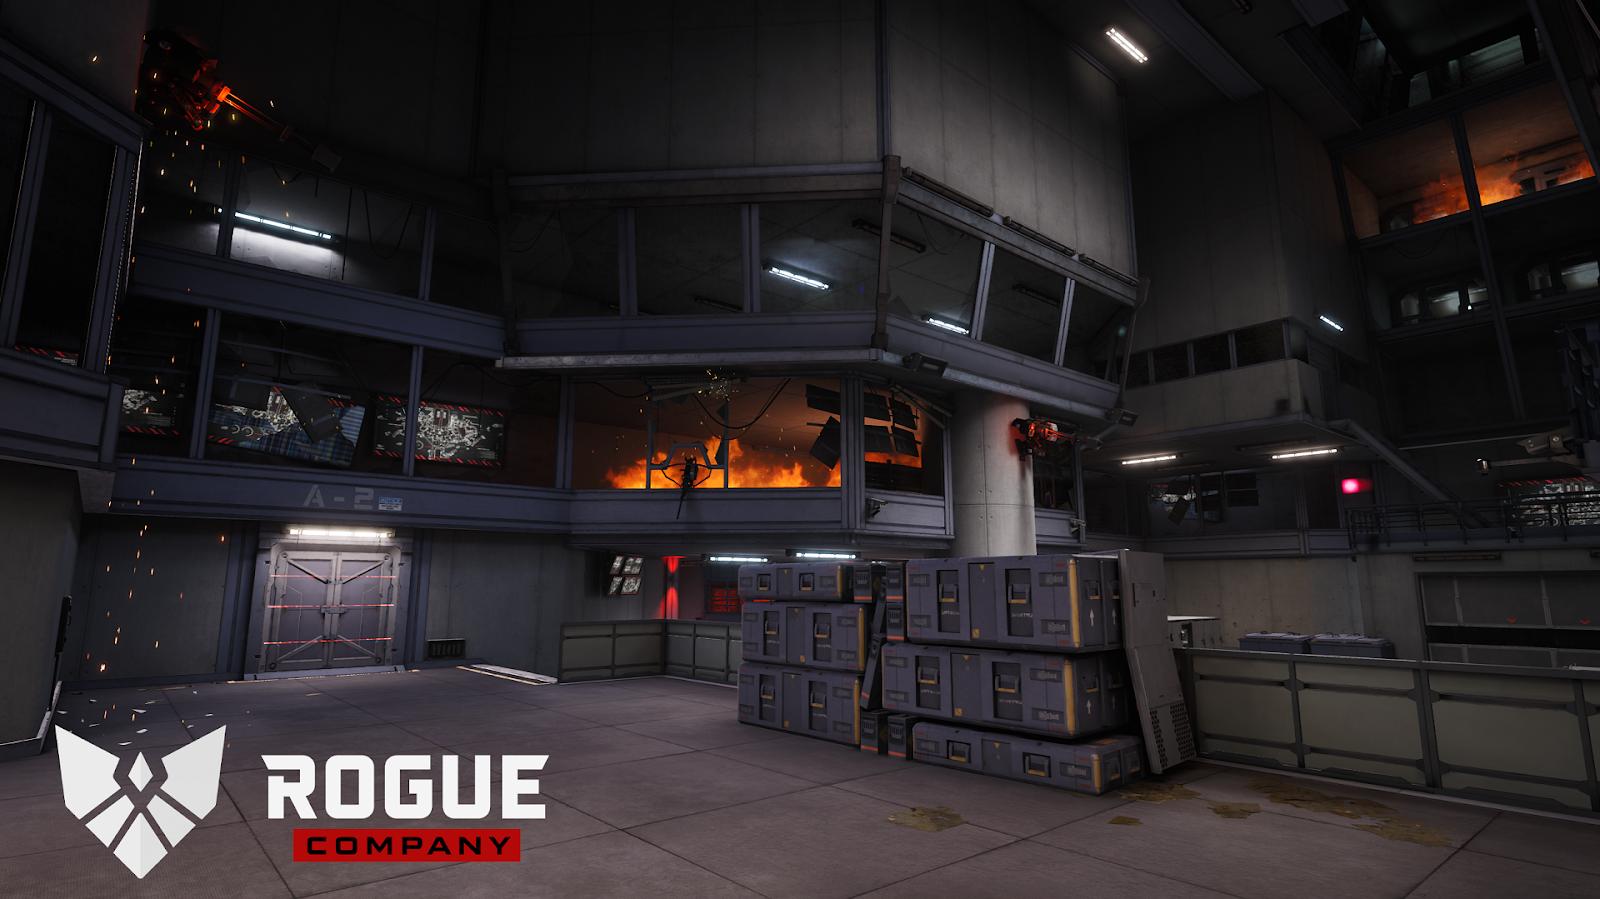 Lockdown in Rogue Company